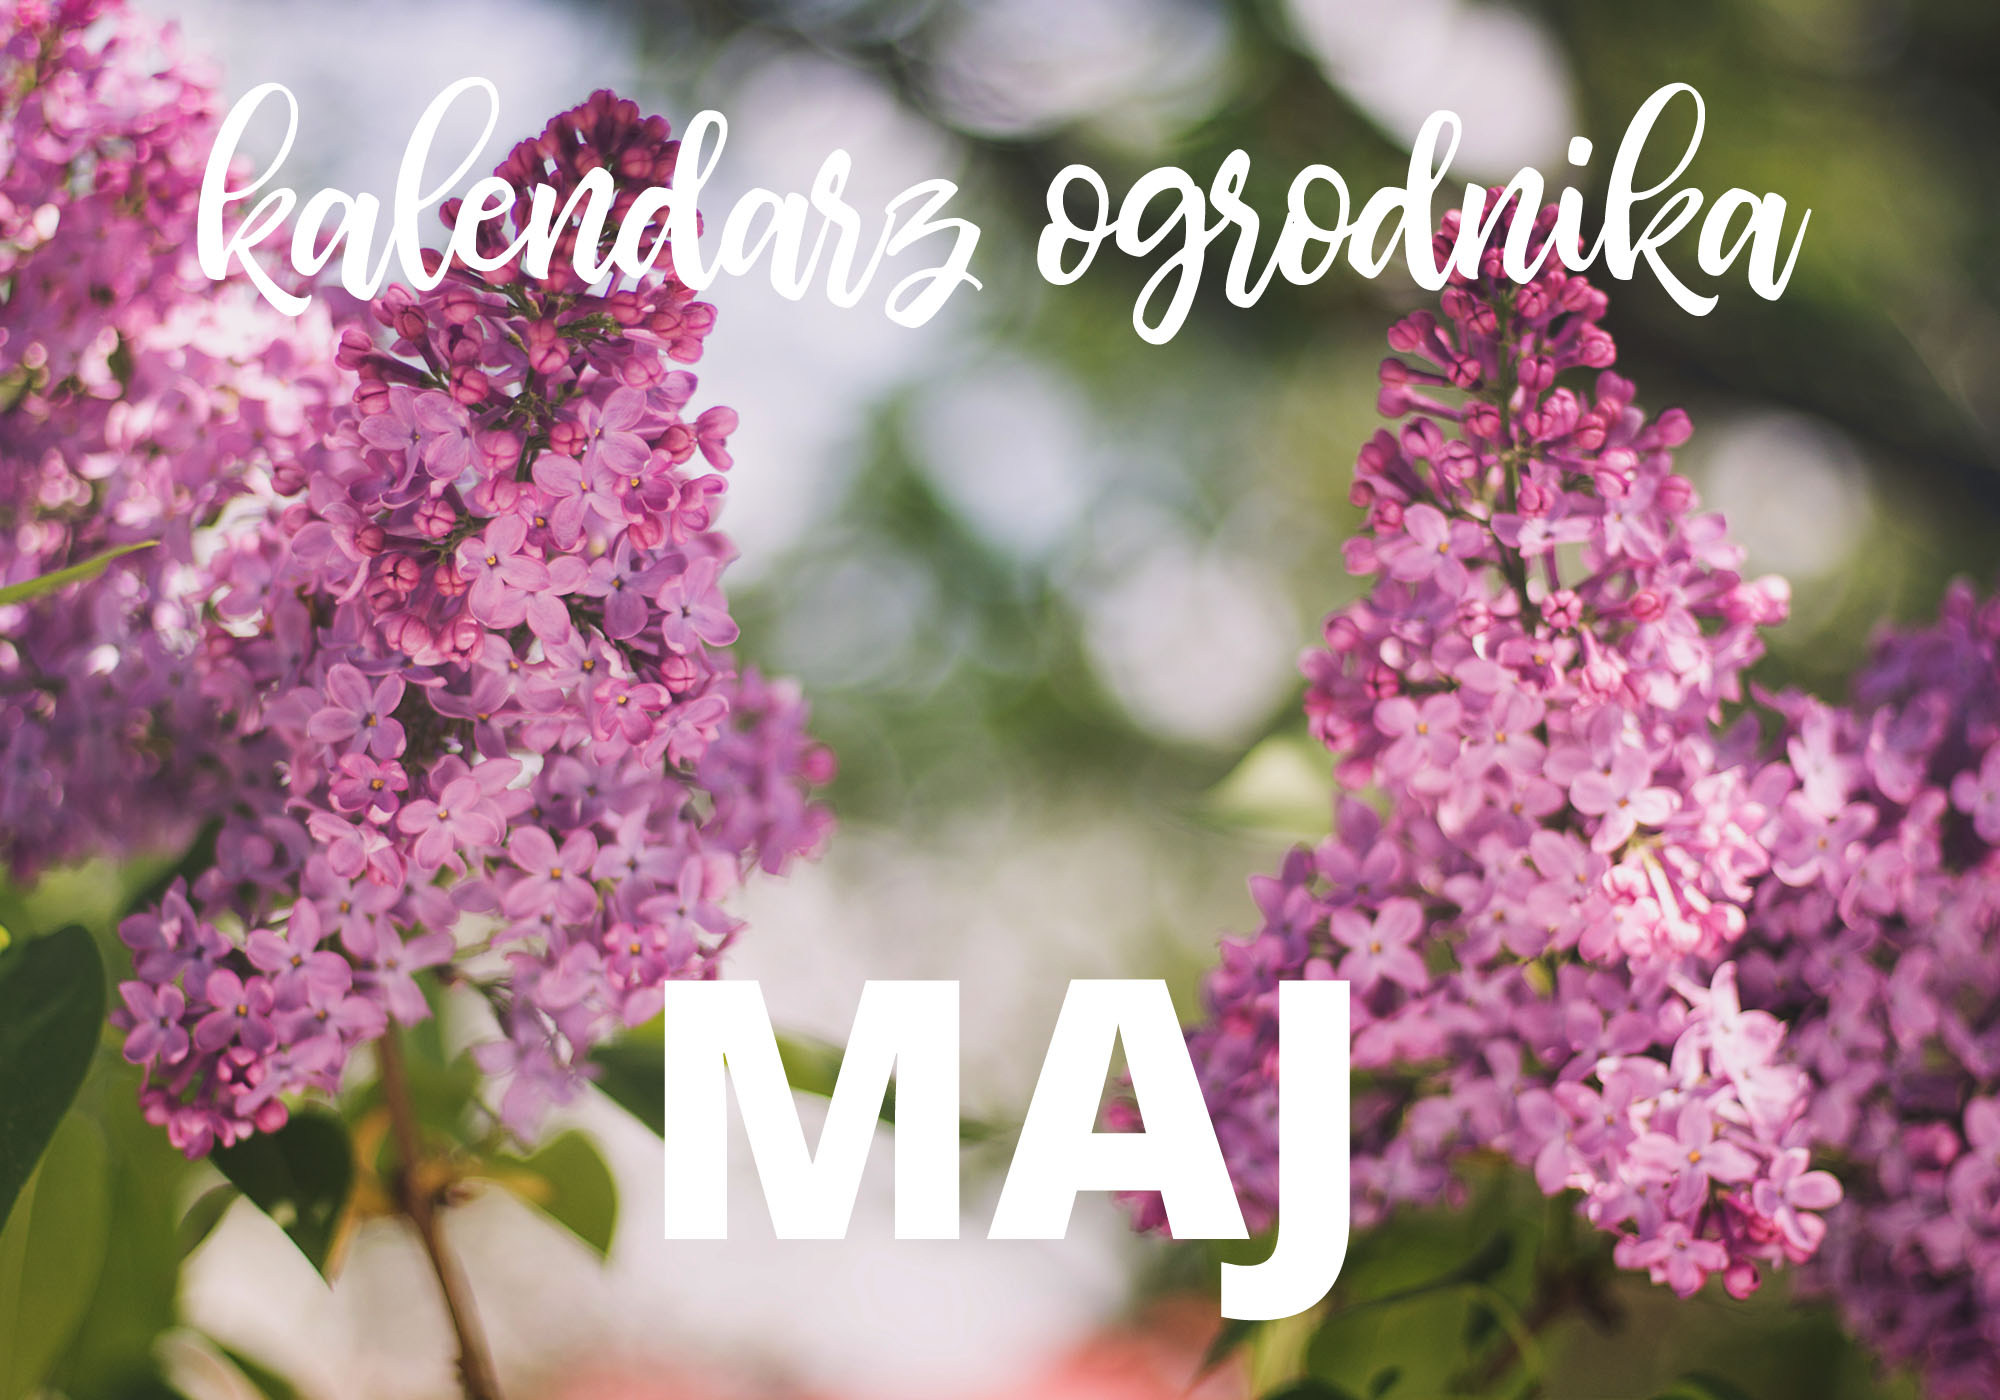 Kalendarz ogrodnika – maj